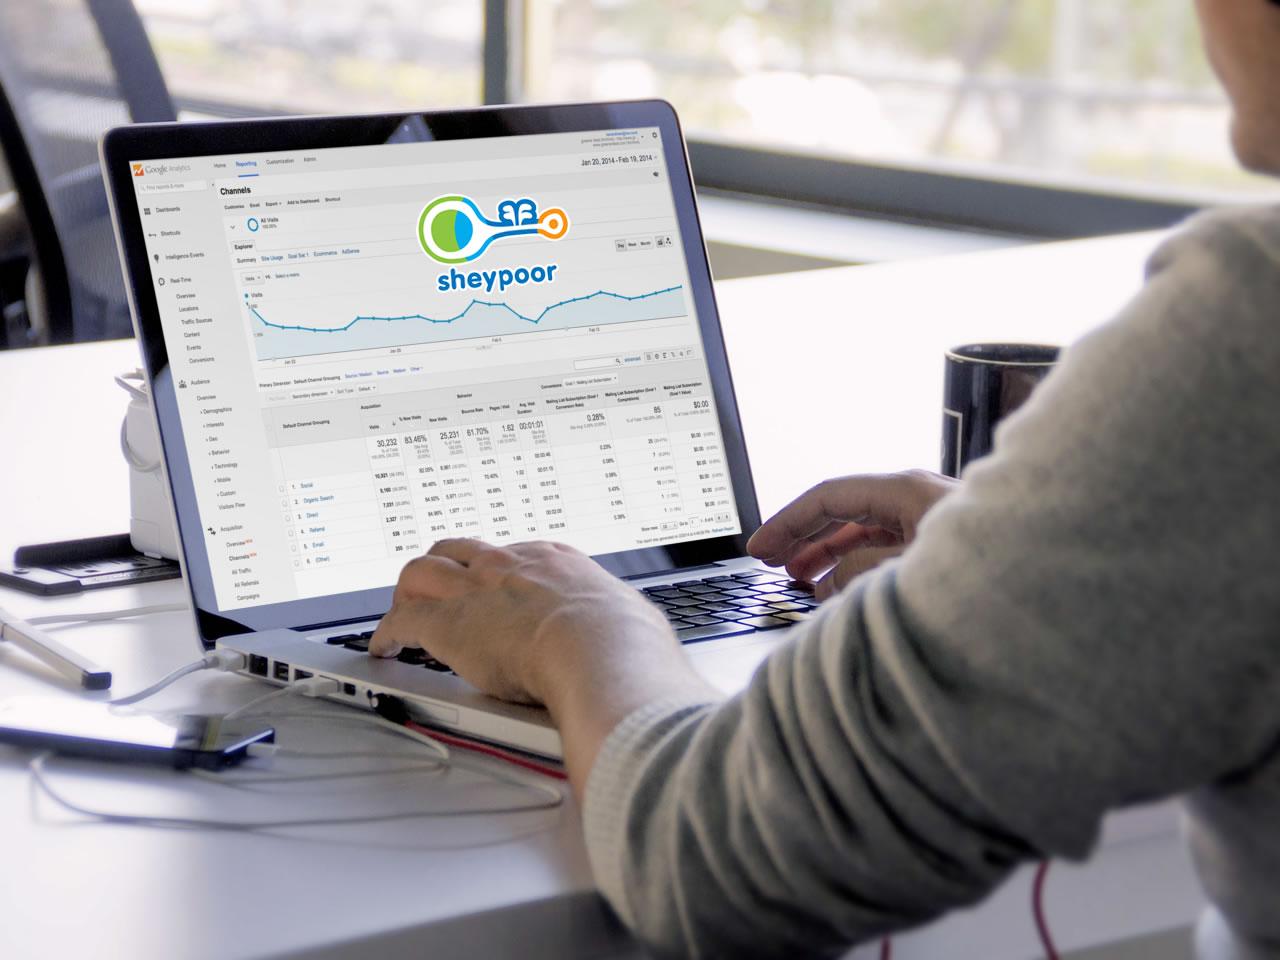 SEO & Social Media Marketing for Sheypoor in IRAN